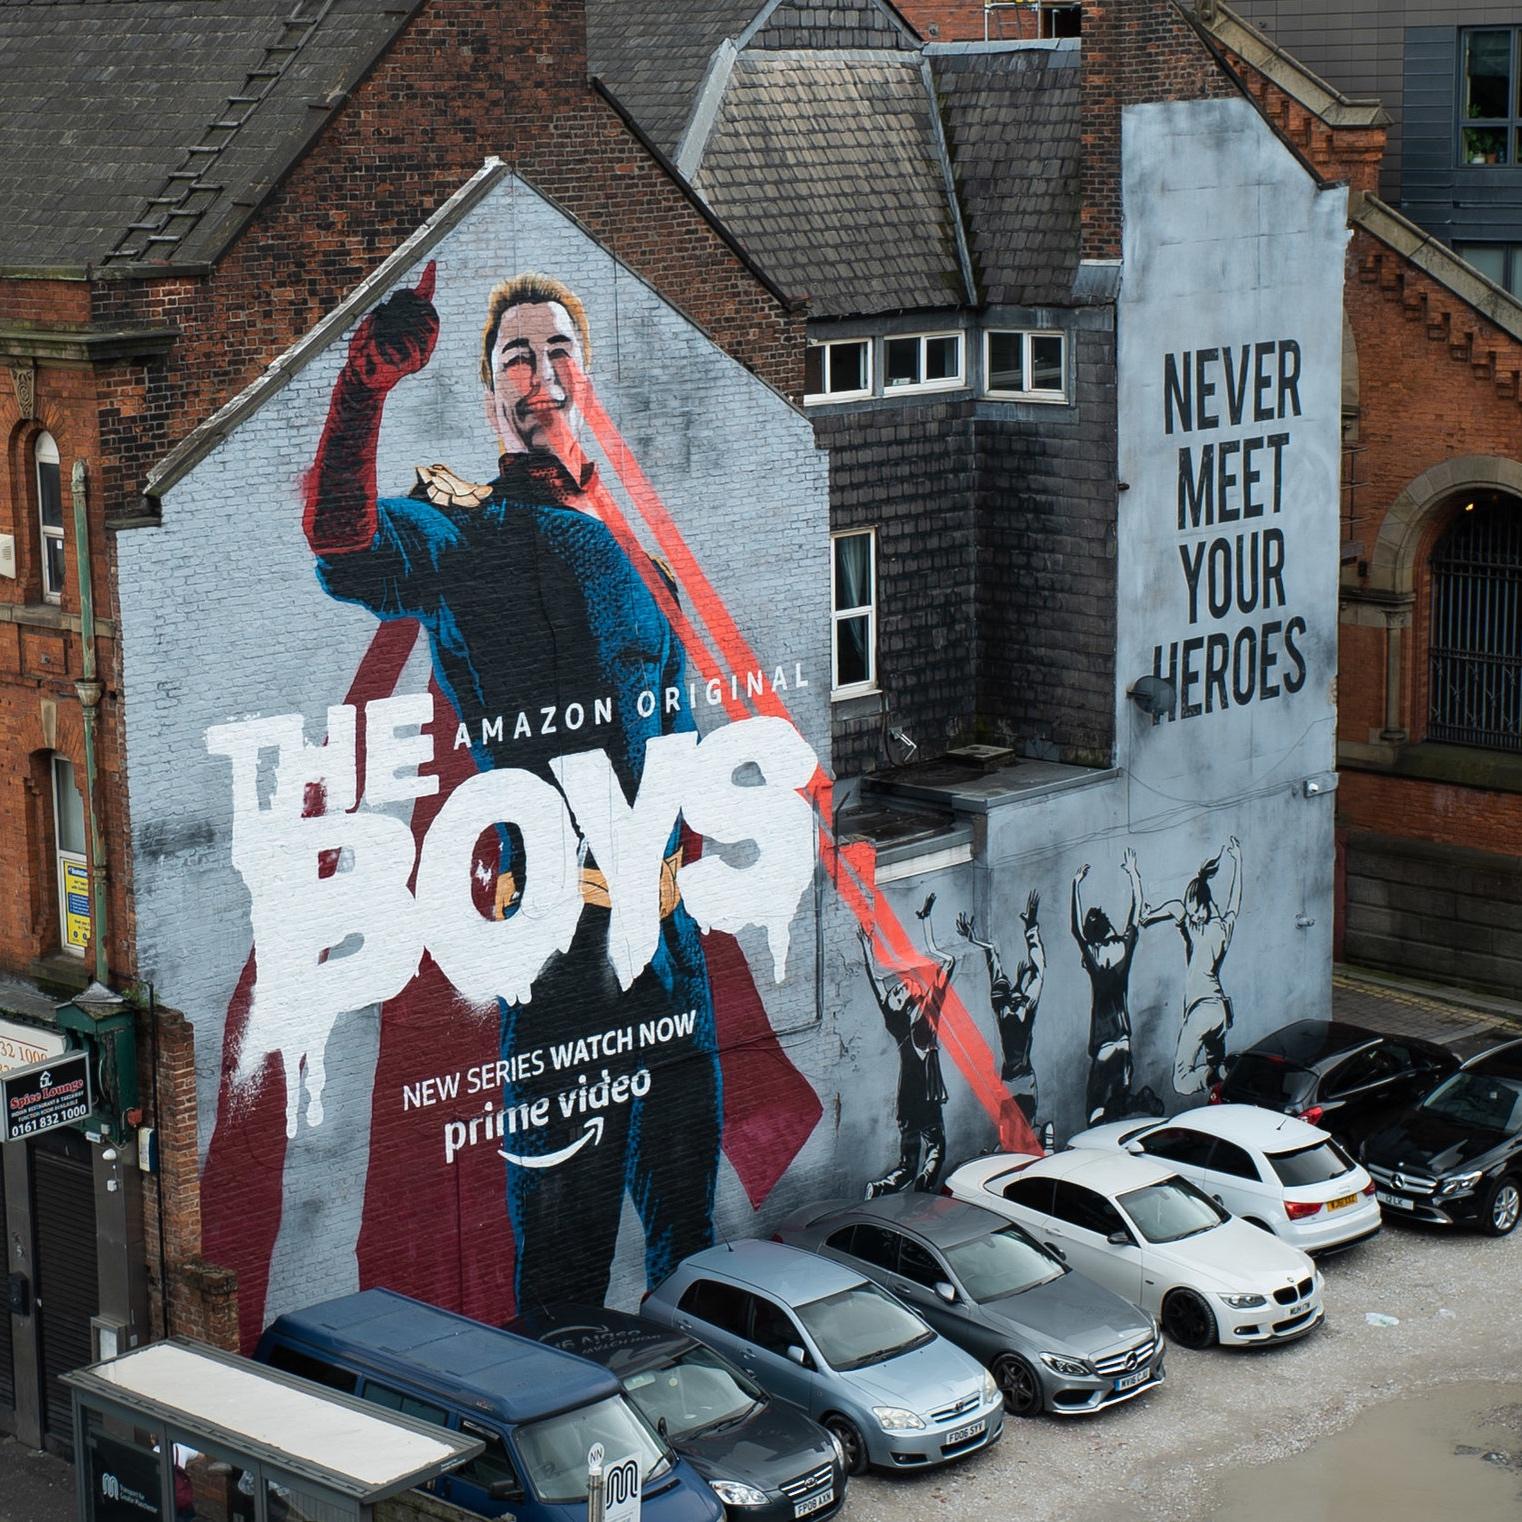 Amazon+The+Boys%2C+Manchester+%283+of+8%29.jpg